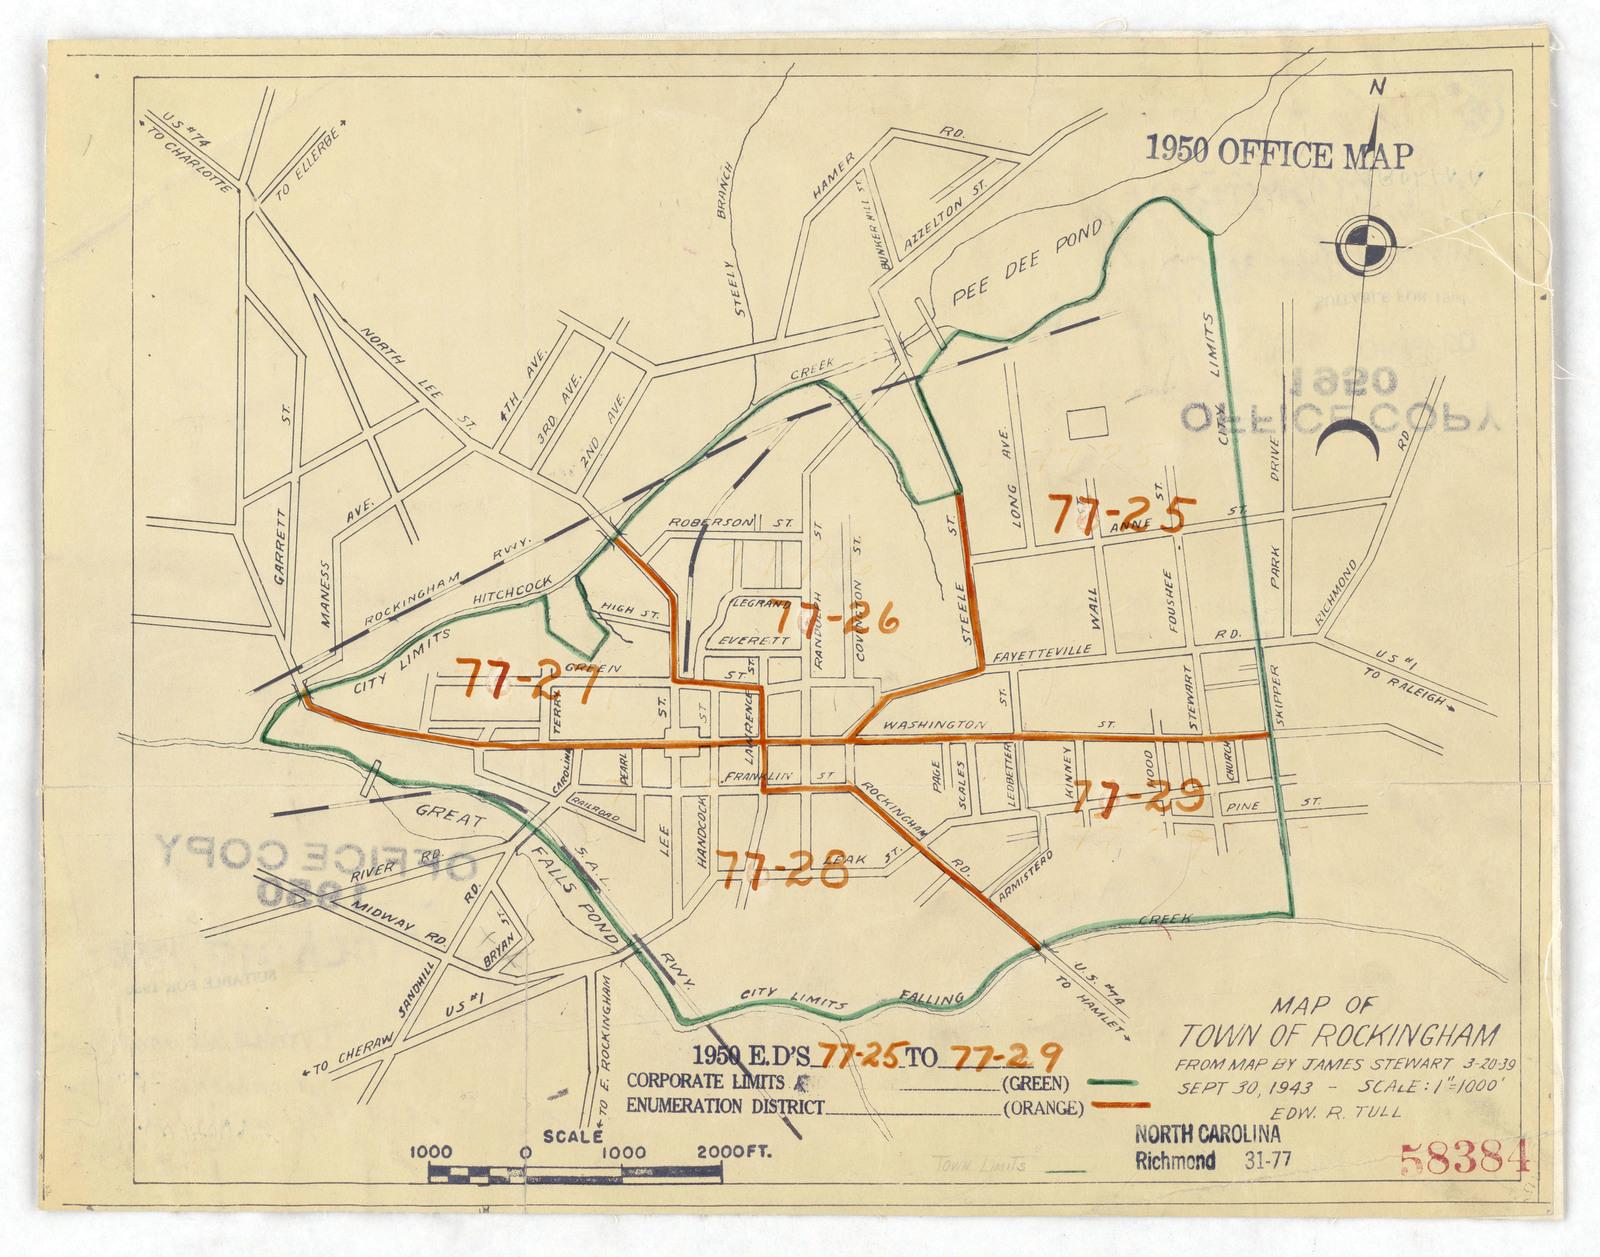 Richmond County Nc Map.1950 Census Enumeration District Maps North Carolina Nc